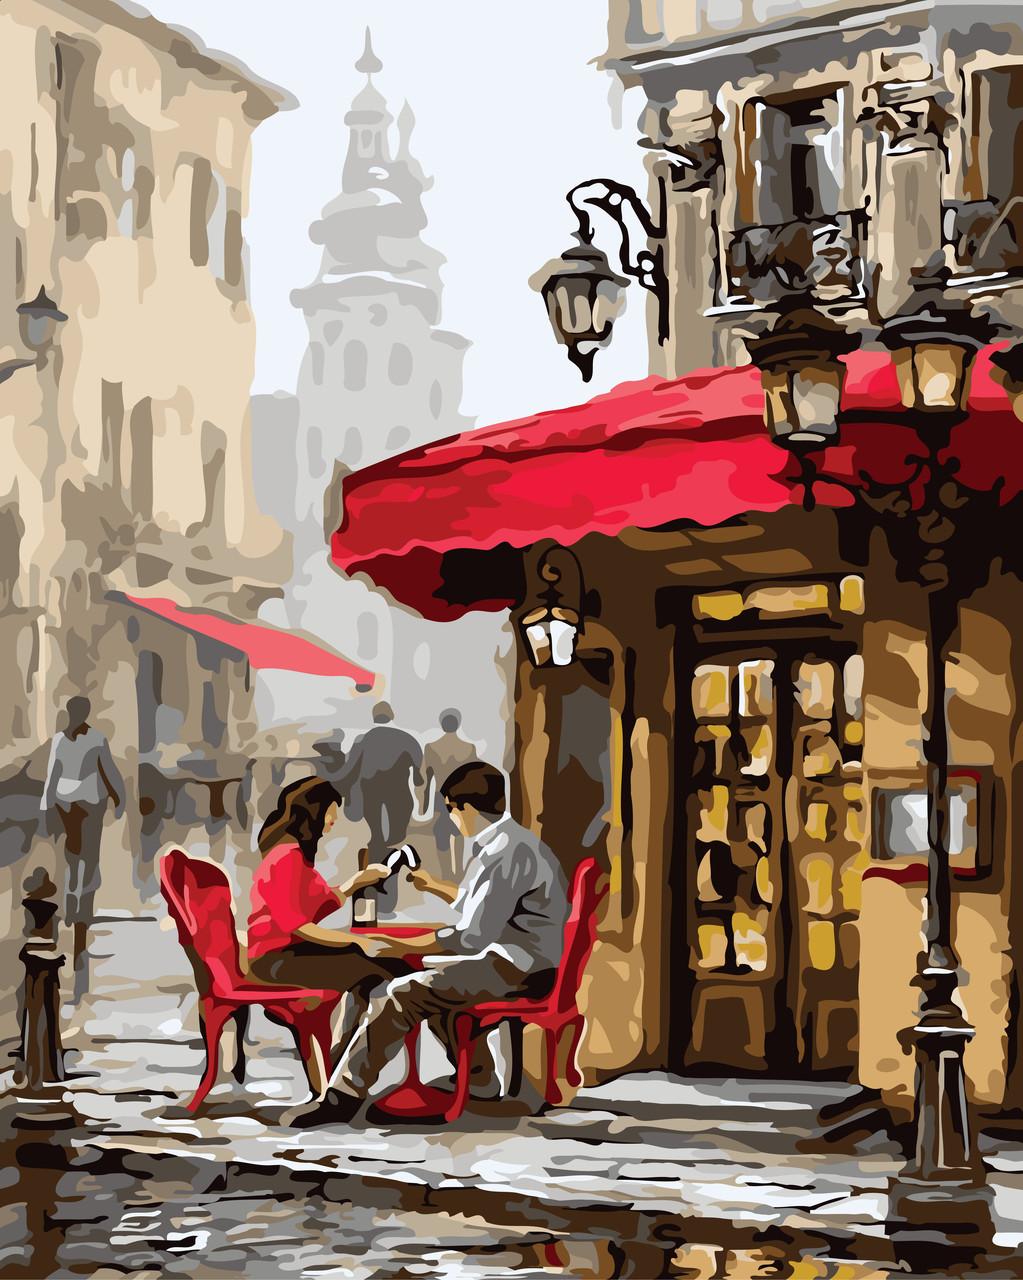 Живопись по номерам Идейка Лондонское кафе худ. МакНейл Ричард (KHO2144) 40 х 50 см (без коробки)